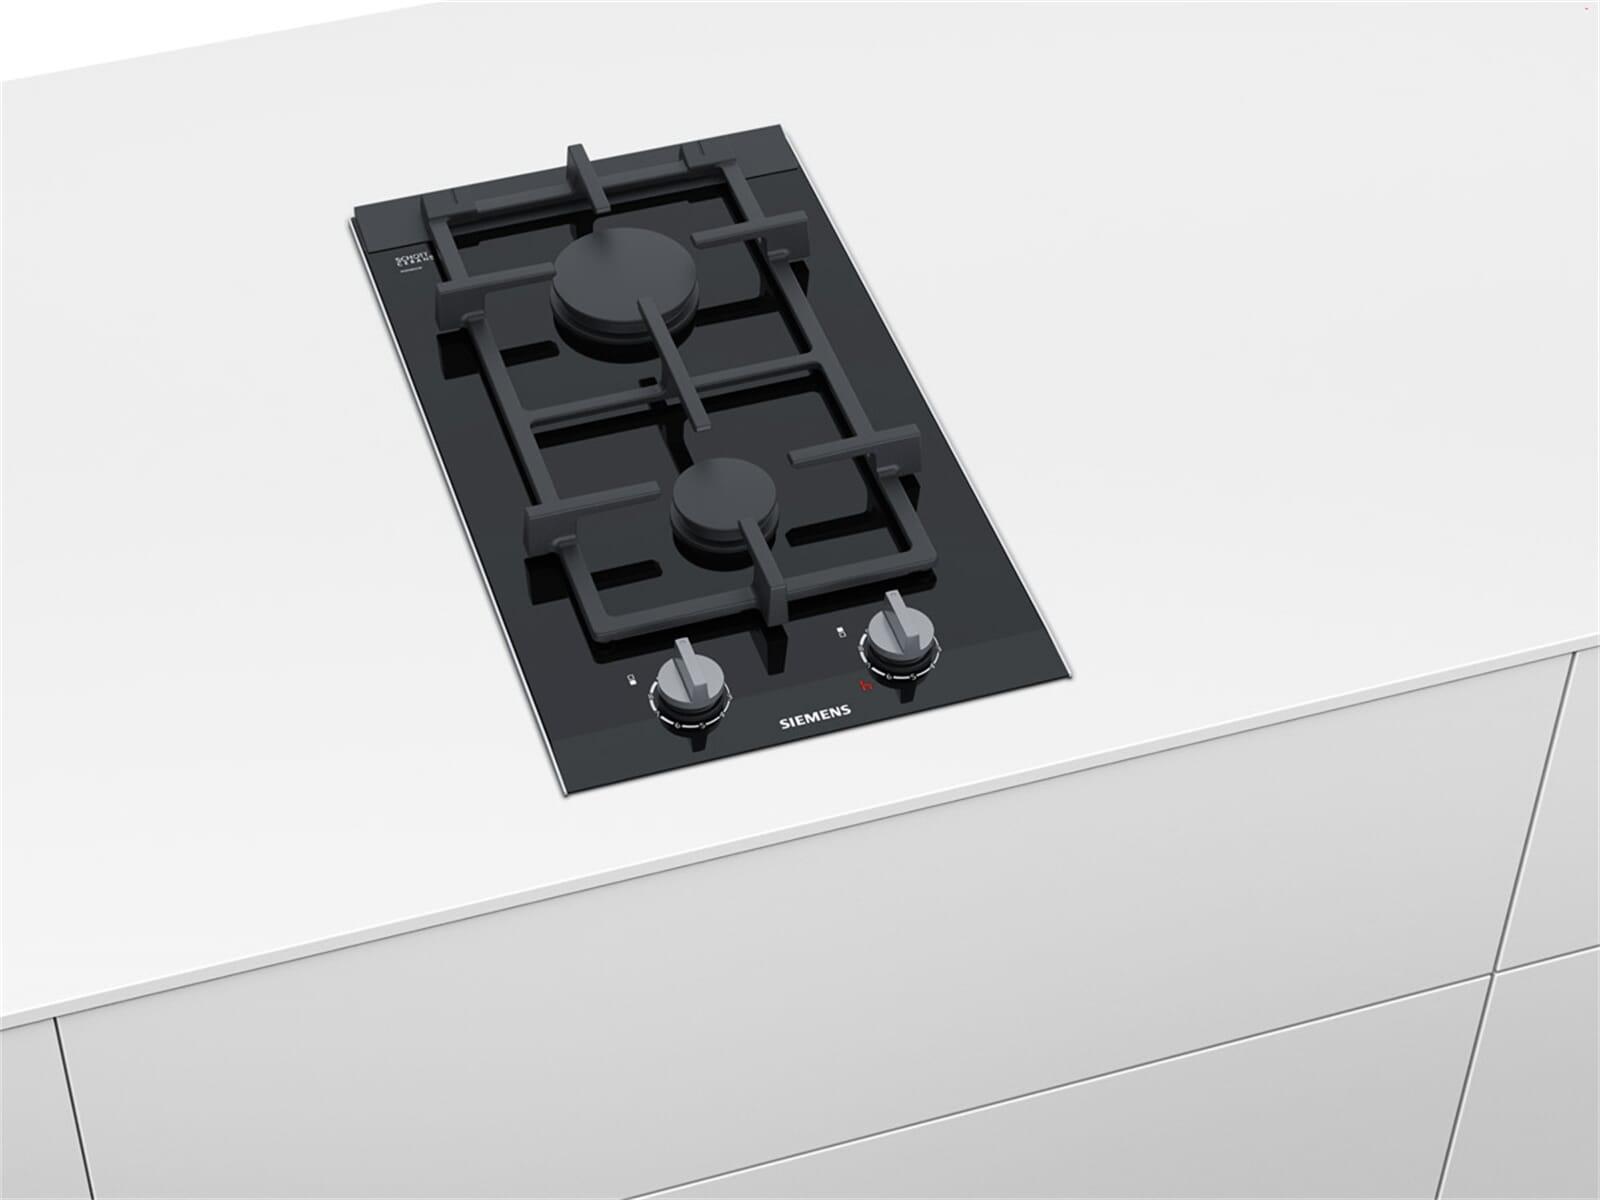 siemens er3a6bd70d domino glaskeramik gaskochfeld autark gas kochfeld gasbrenner ebay. Black Bedroom Furniture Sets. Home Design Ideas